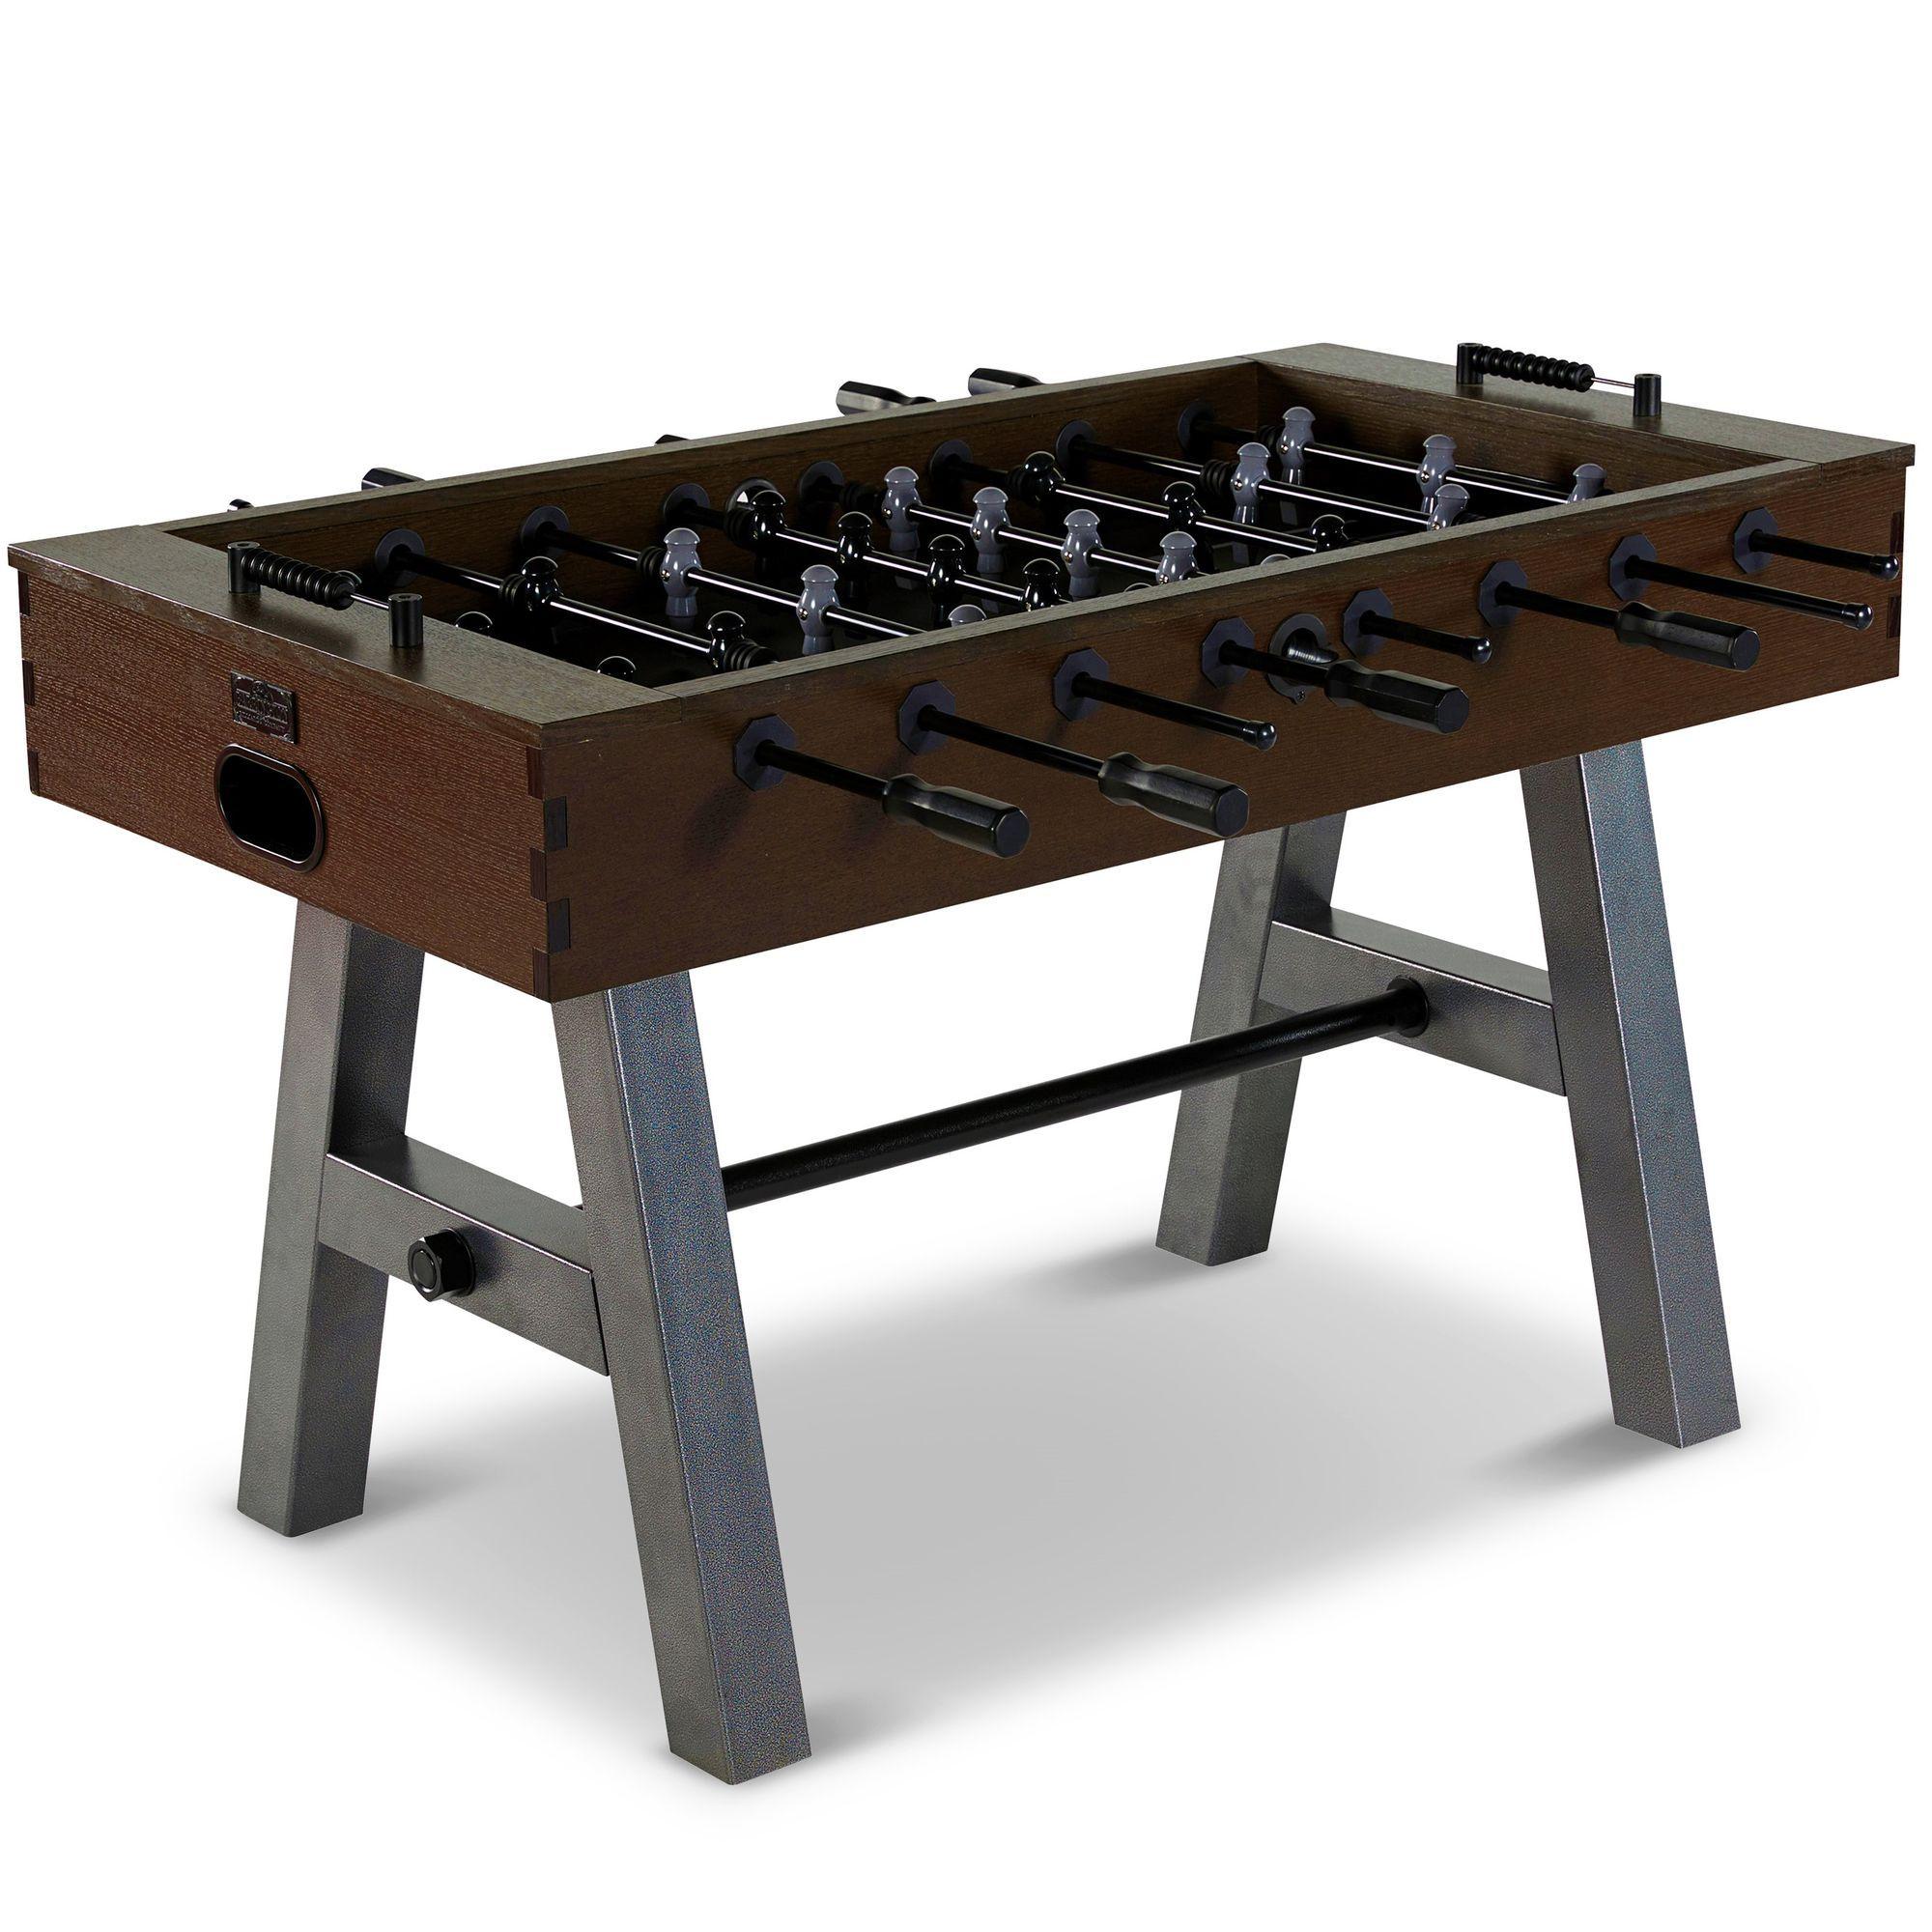 "Barrington 56"" Evanston Foosball Soccer Table, Steel Leg"